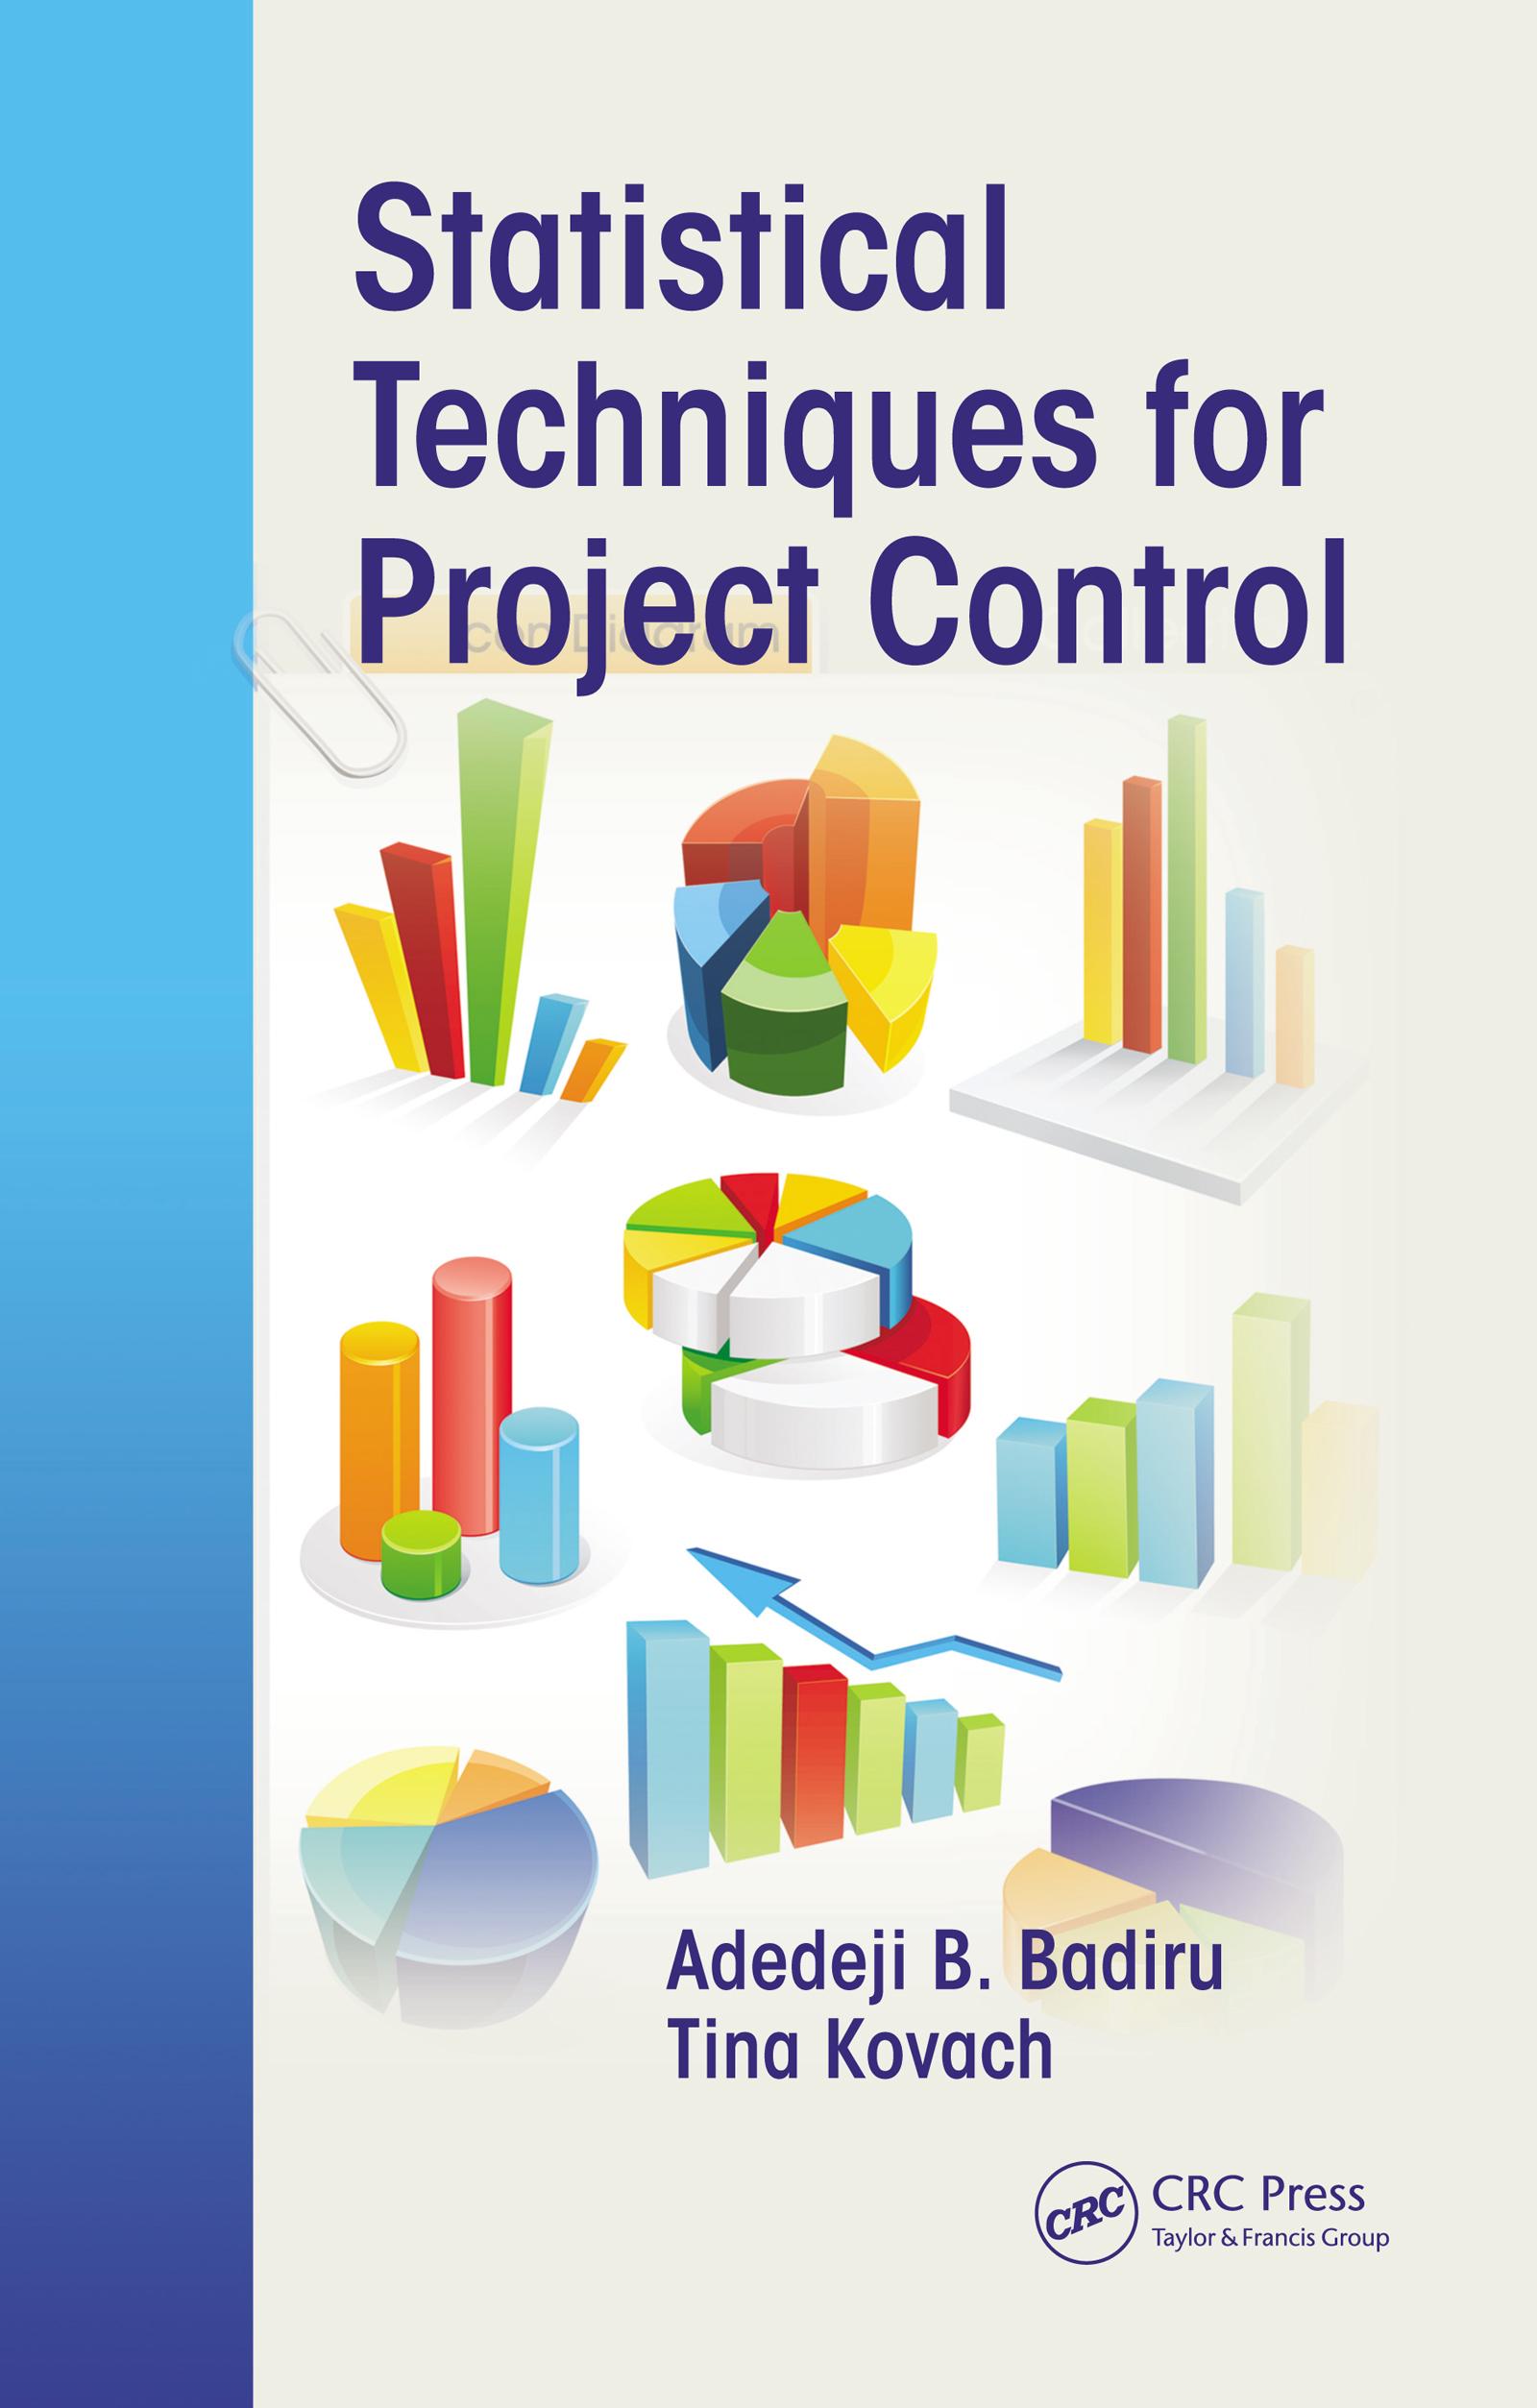 Download Ebook Statistical Techniques for Project Control by Adedeji B. Badiru Pdf